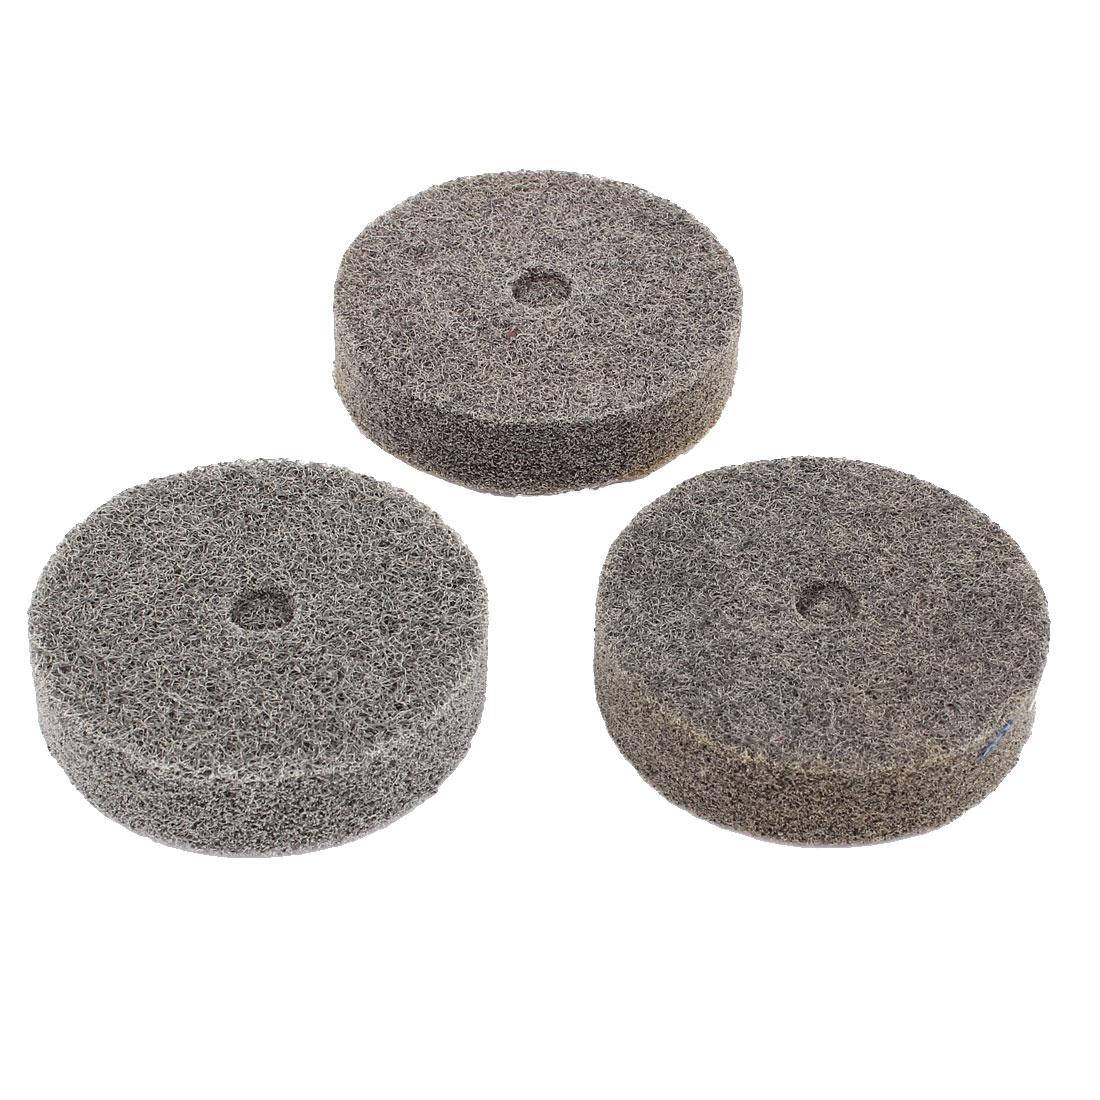 3pcs 180 Grit Gray Nylon Fiber Cylindrical Grinding Wheel Grinder Tool